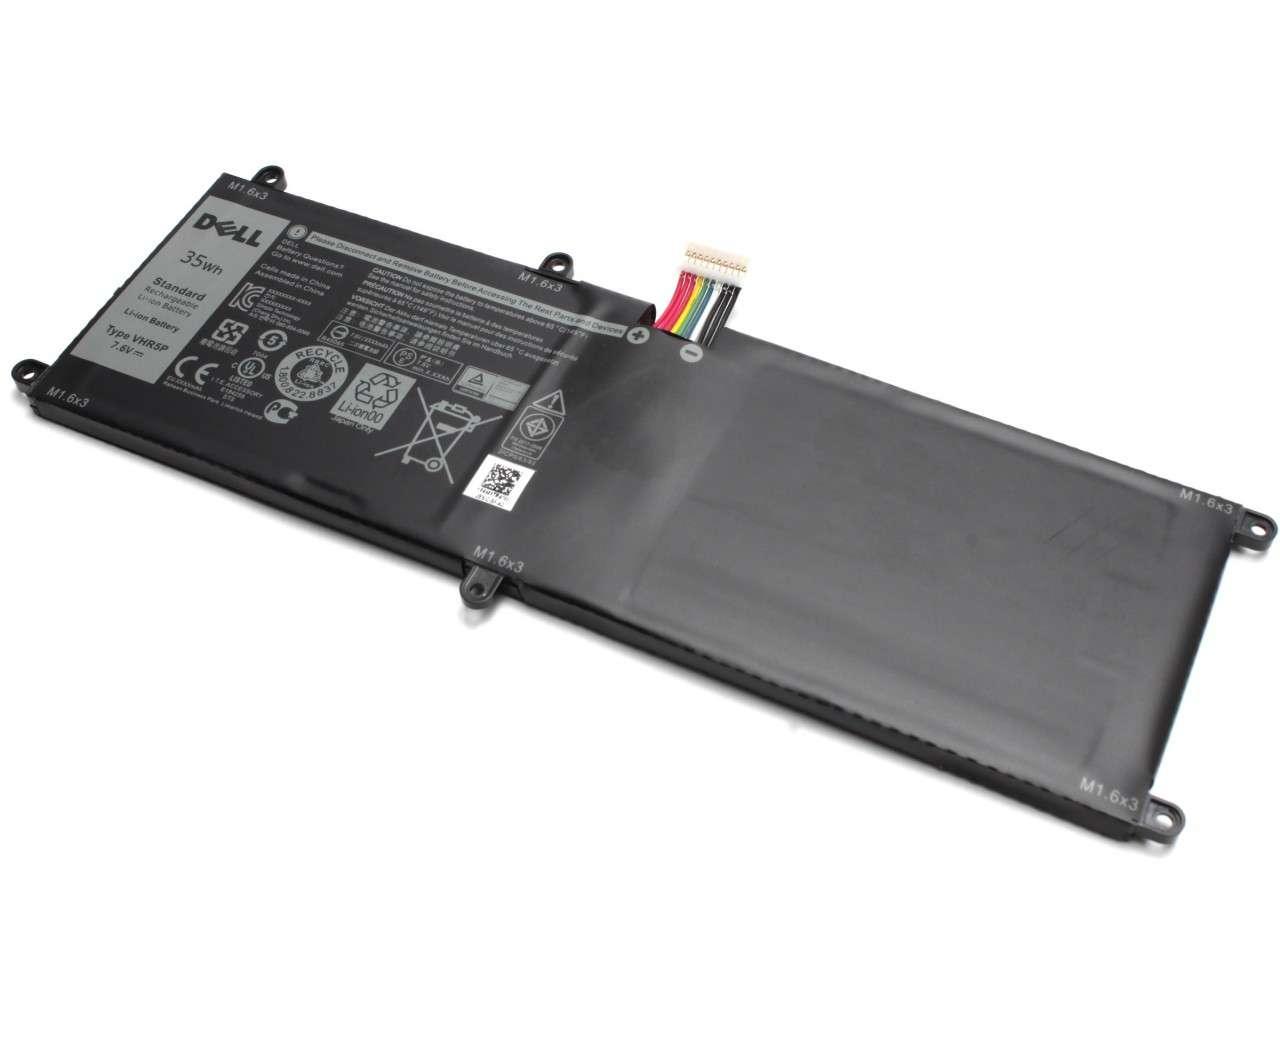 Baterie Dell Latitude 5179 Tablet Originala 35Wh imagine powerlaptop.ro 2021